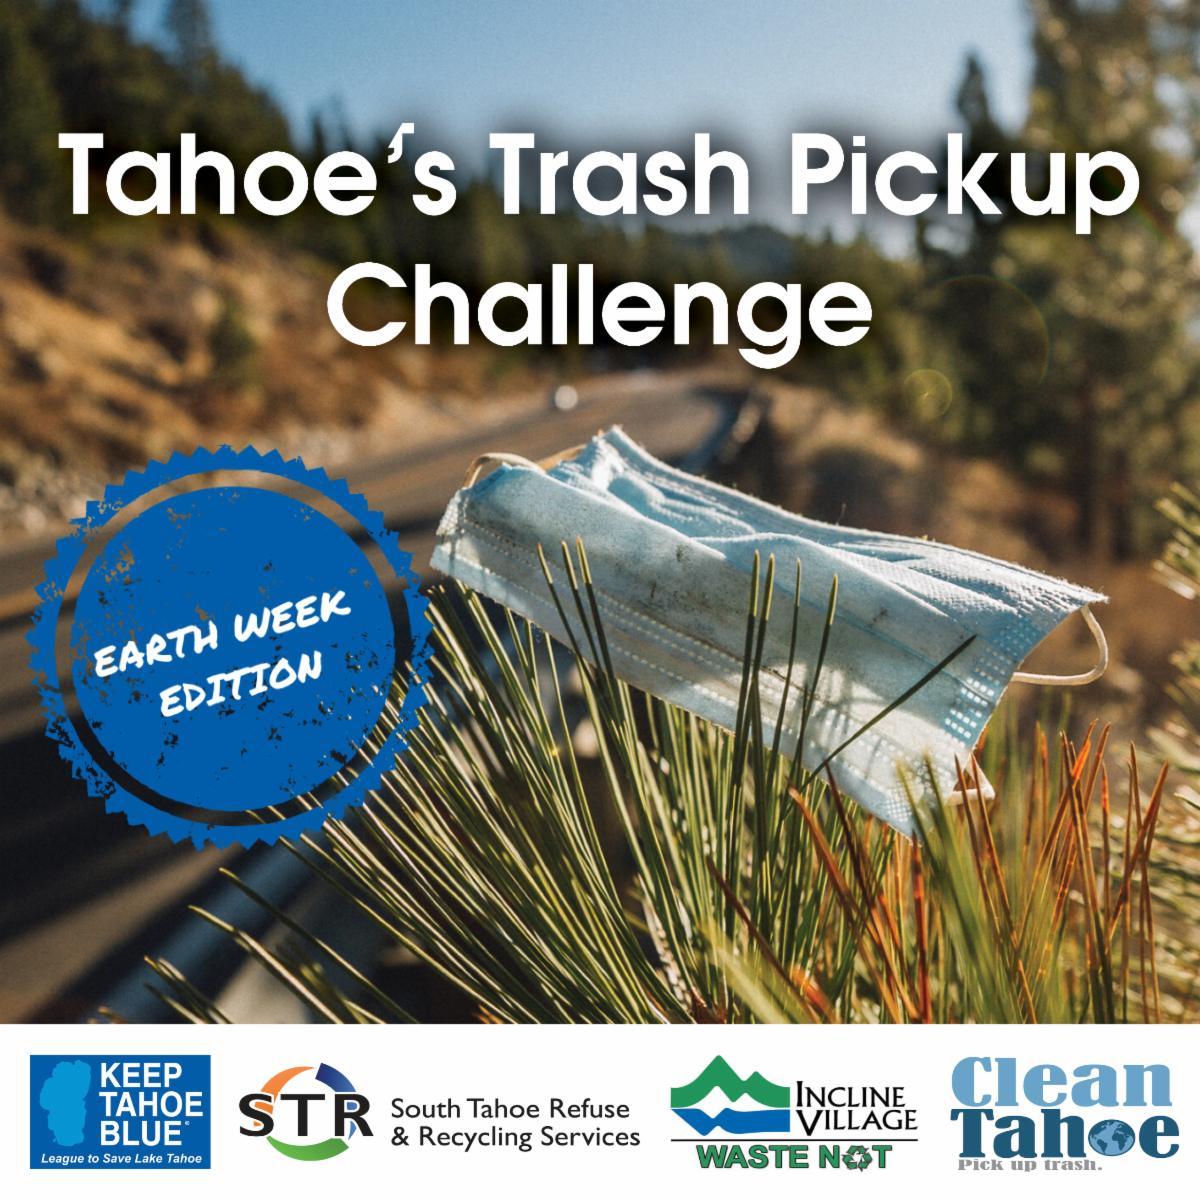 Tahoe's Trash Pickup Challenge-Earth Week Edition